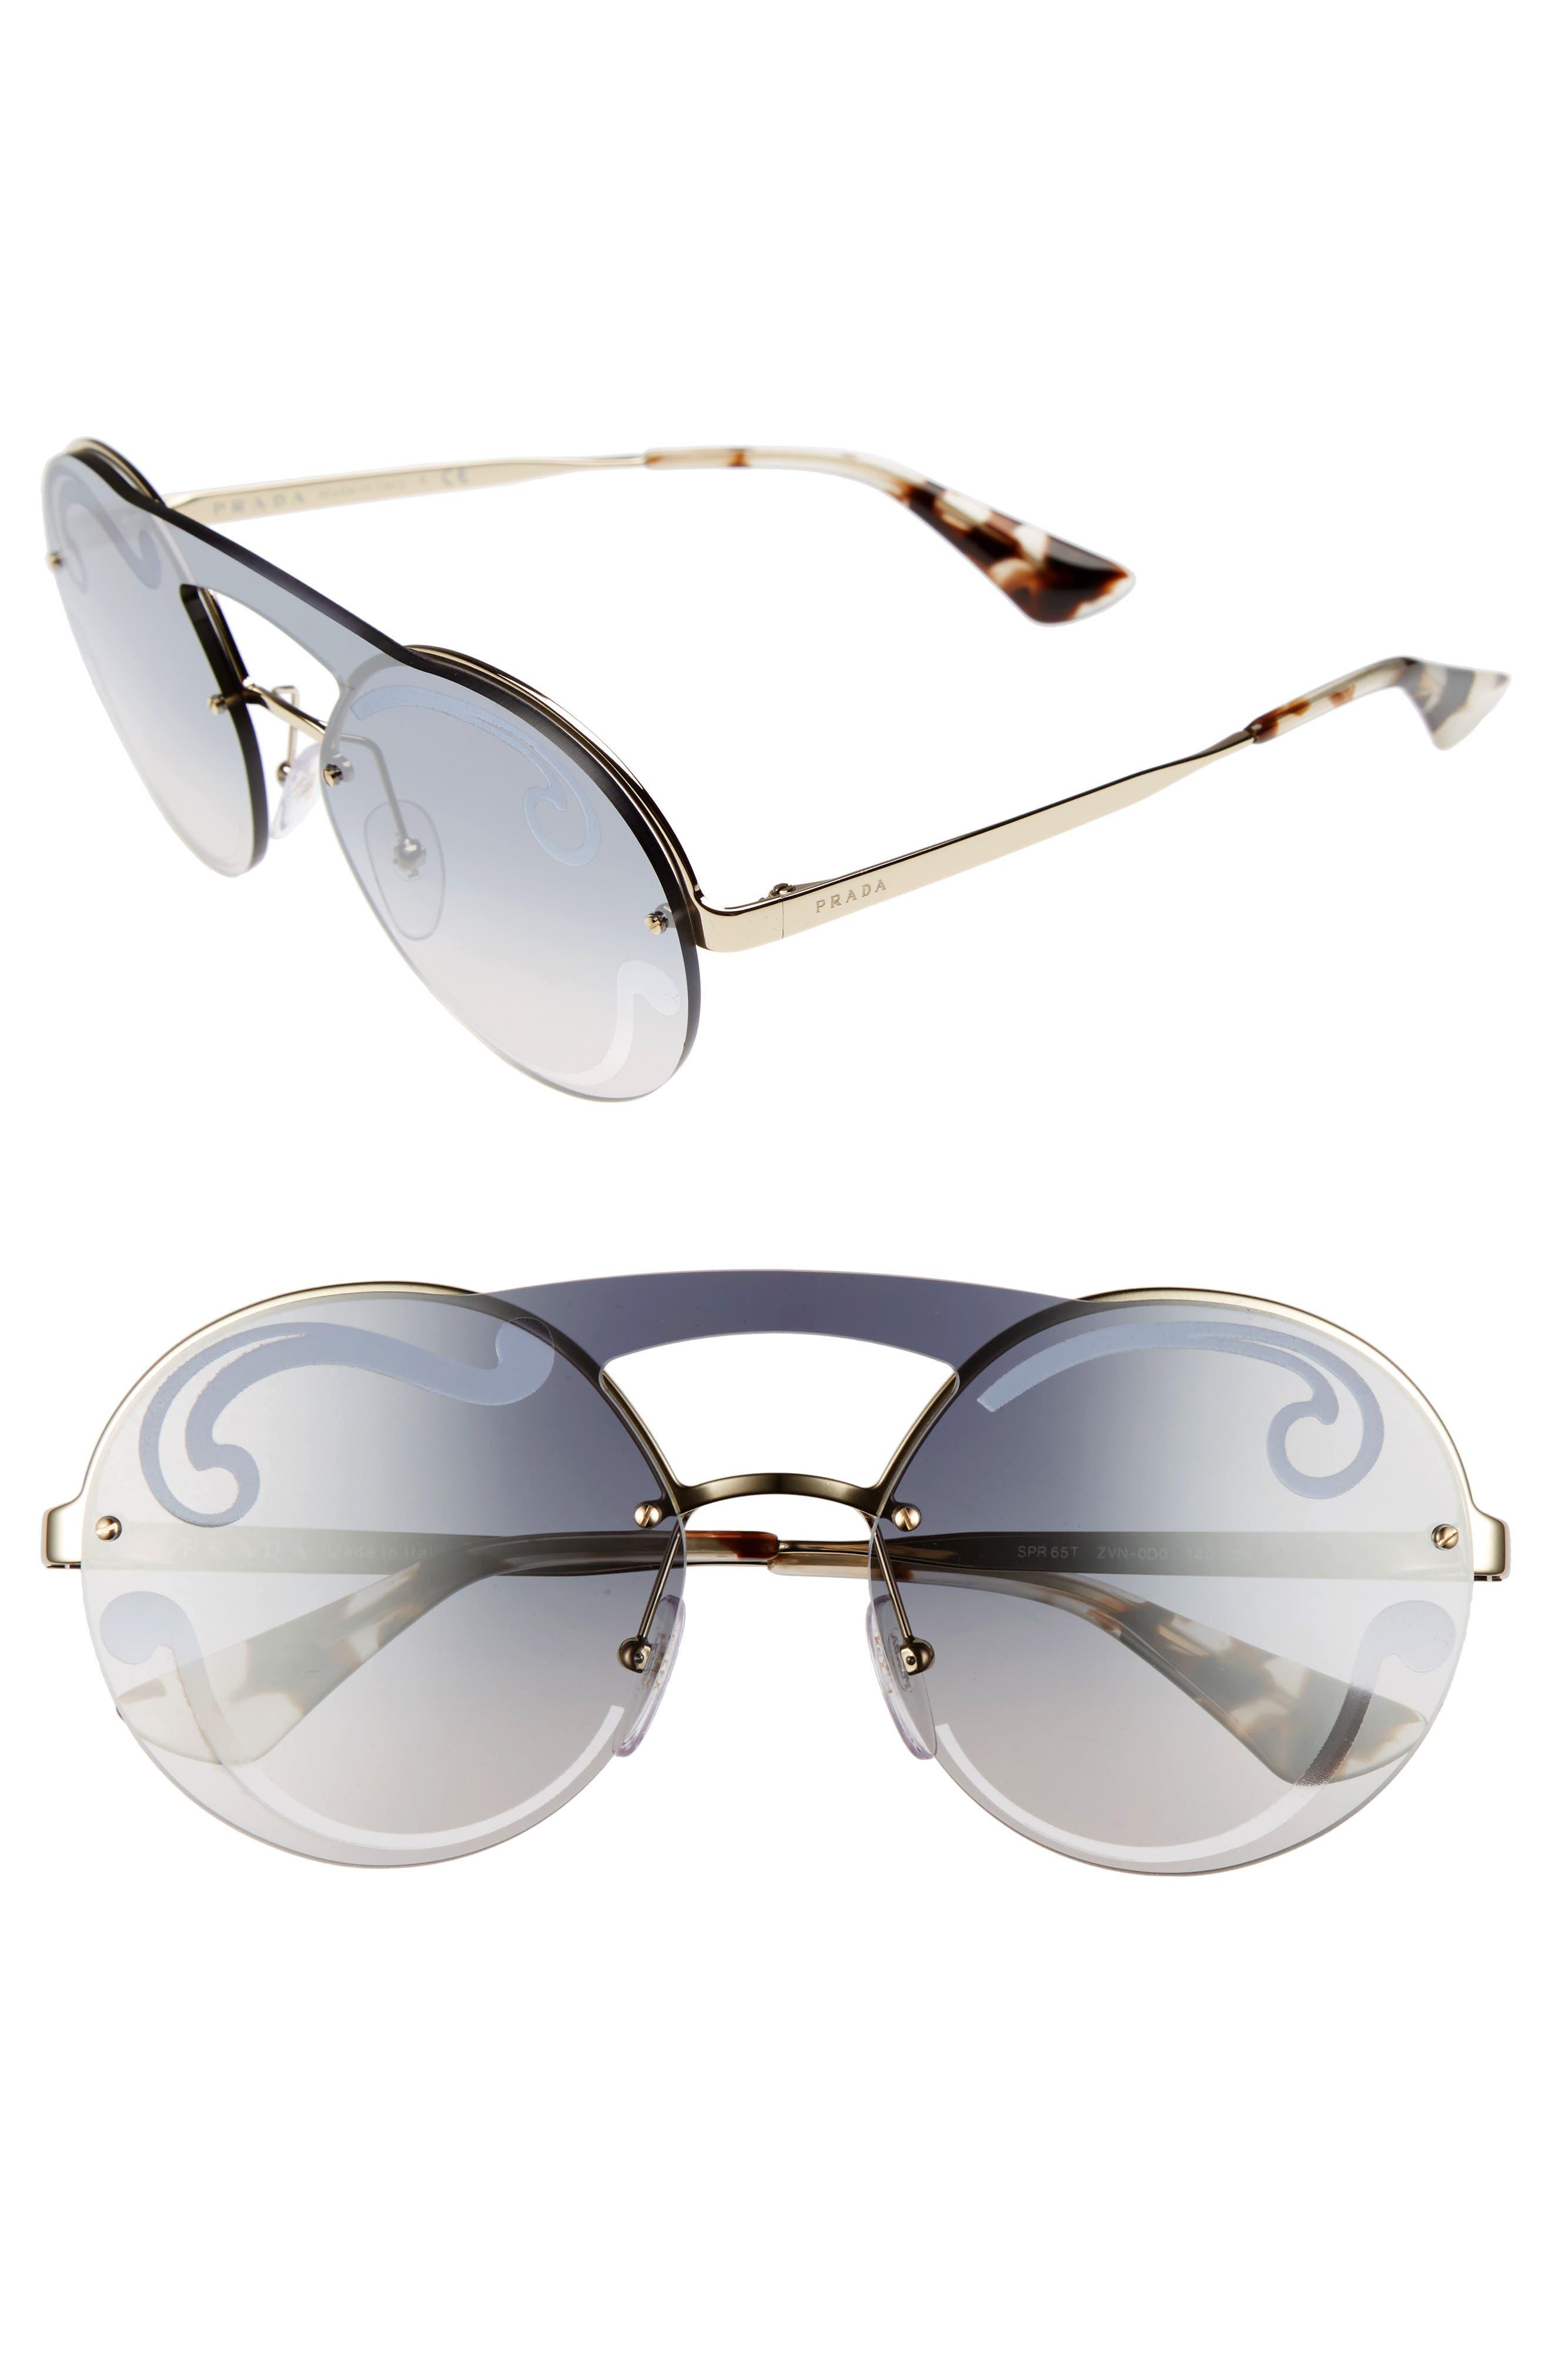 Prada Round Rimless Sunglasses